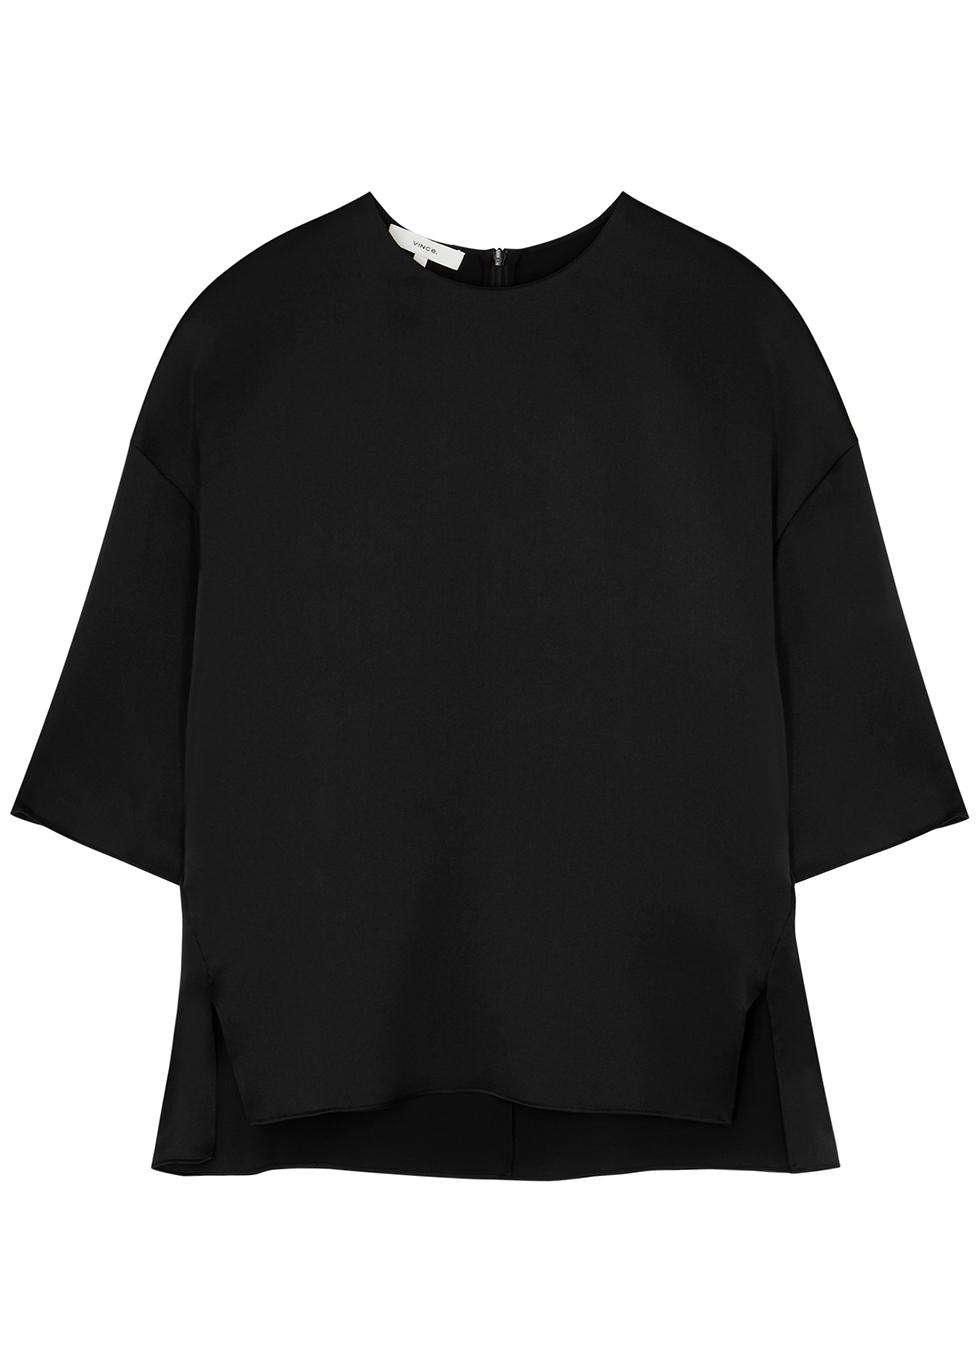 Women's Designer Tops Lace & Silk Harvey Nichols